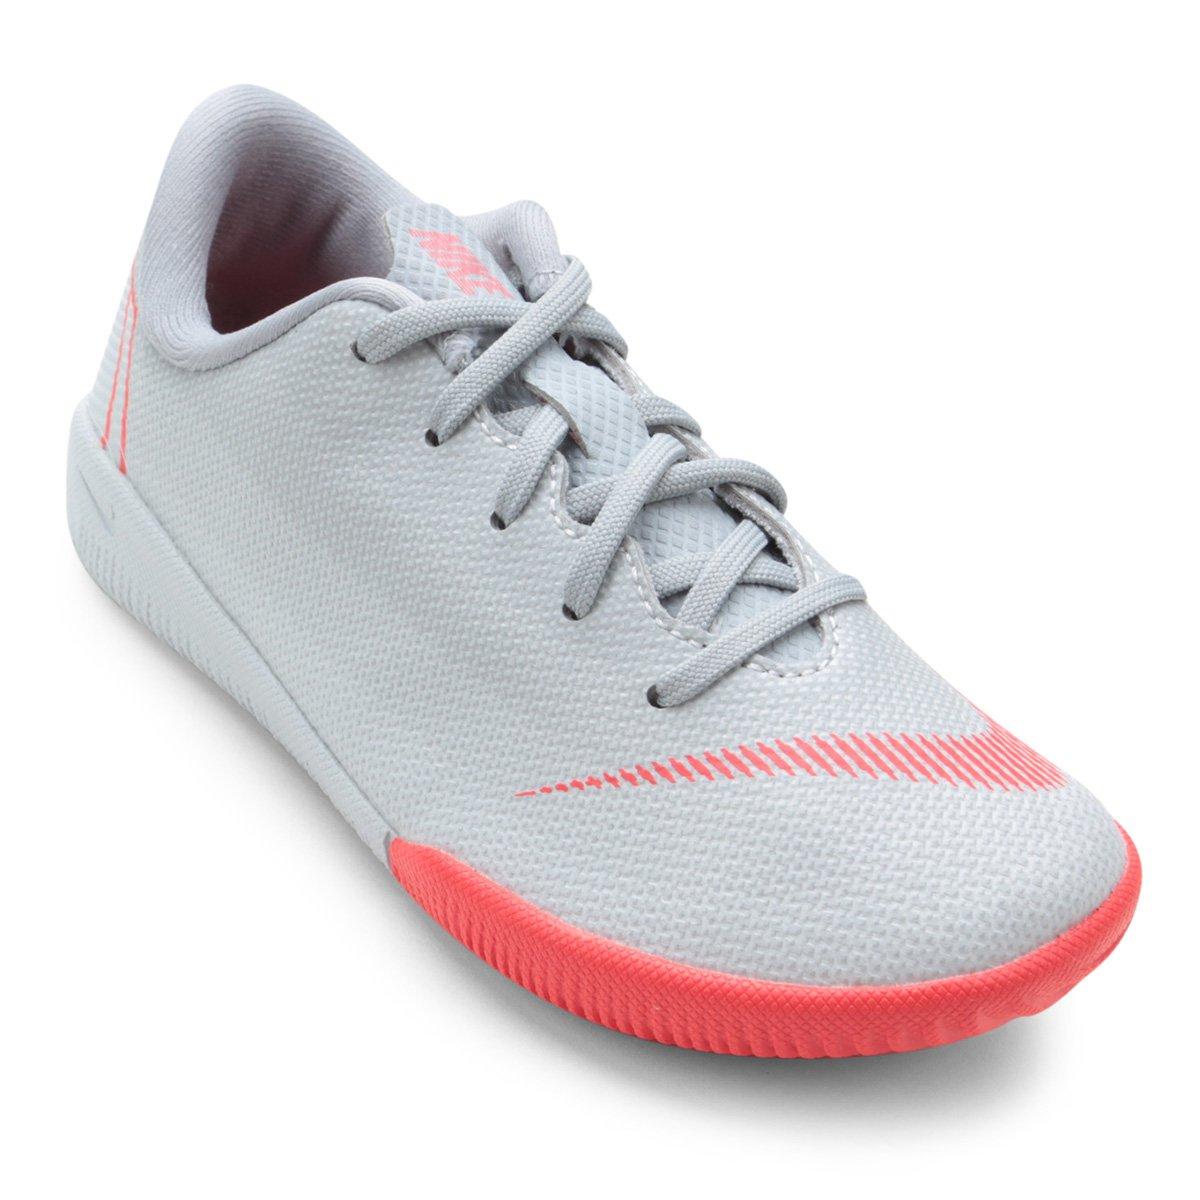 e10e7feefc Chuteira Futsal Infantil Nike Mercurial Vapor 12 Academy